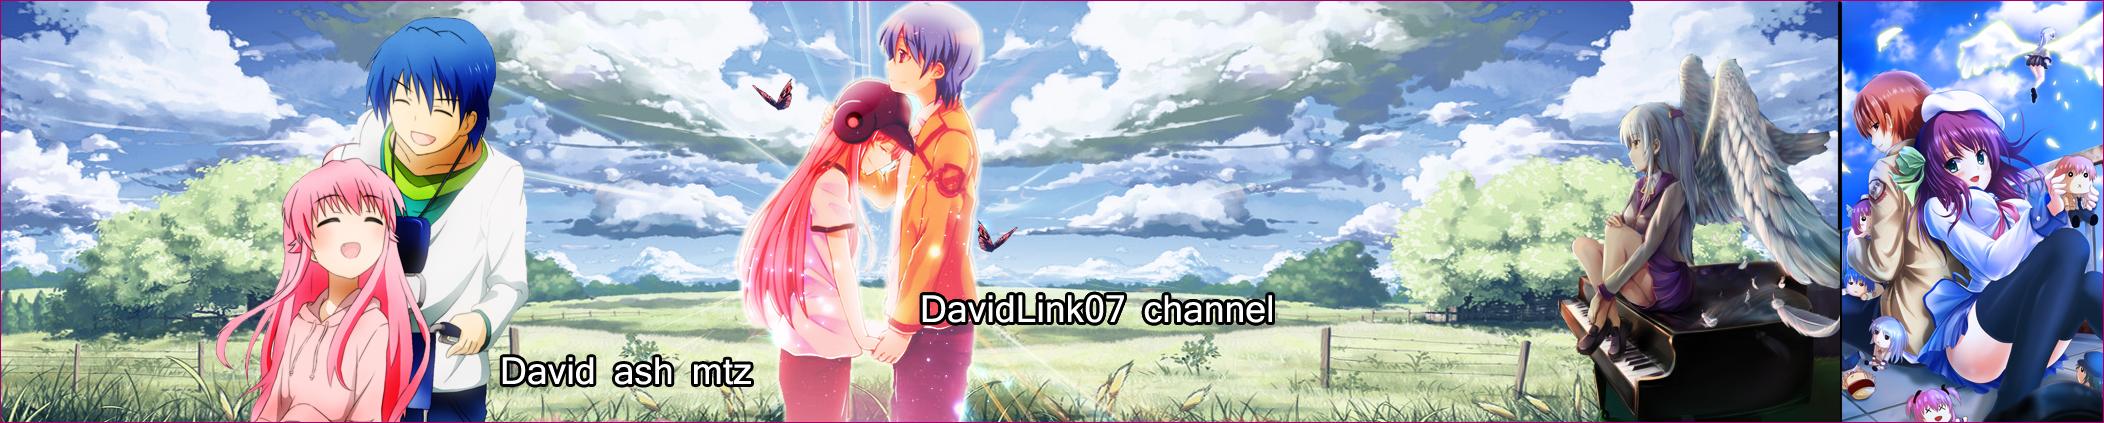 youtube channel anime art by davidlink on DeviantArt